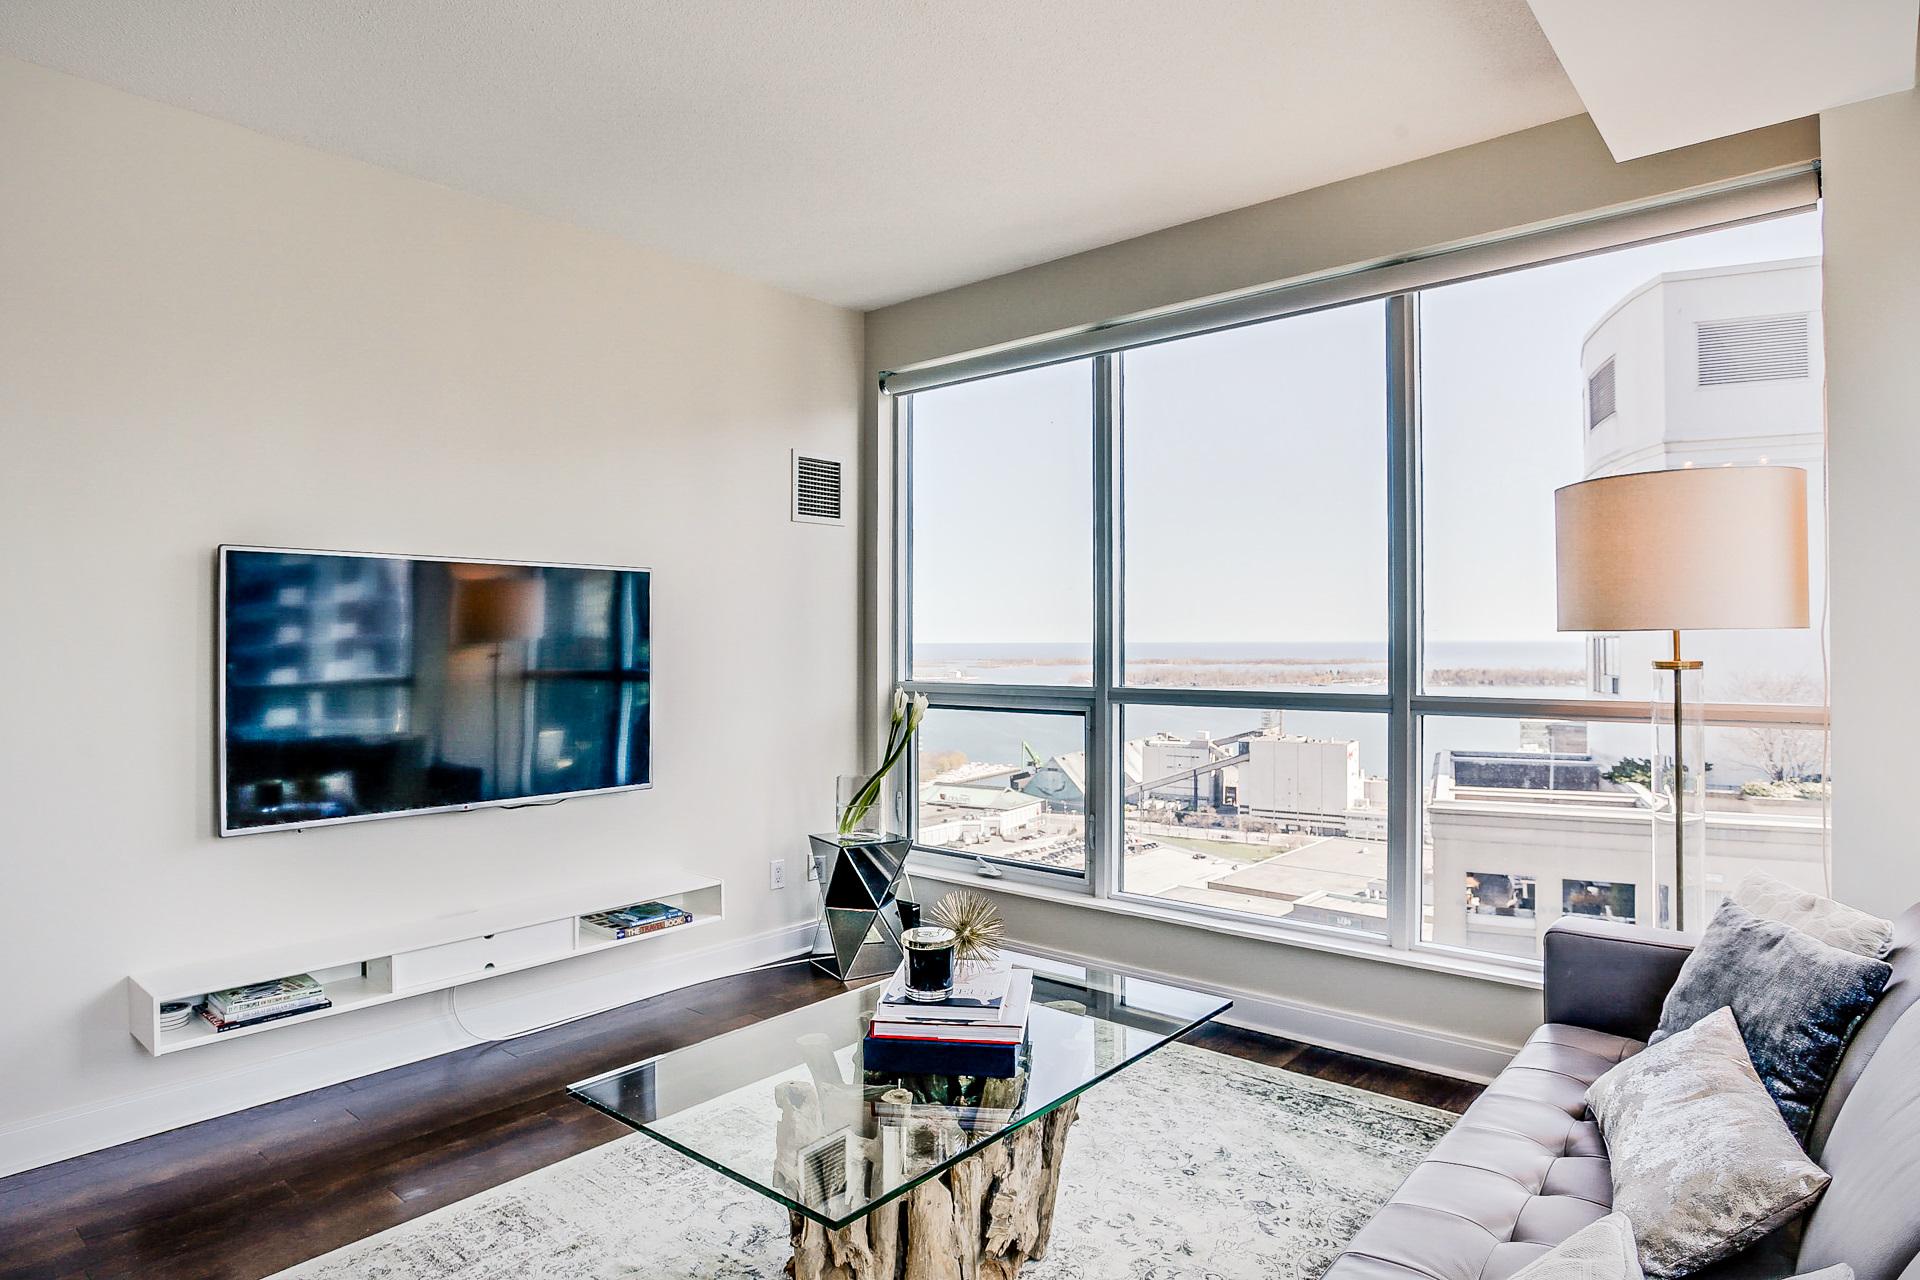 Living Room With Lake Views